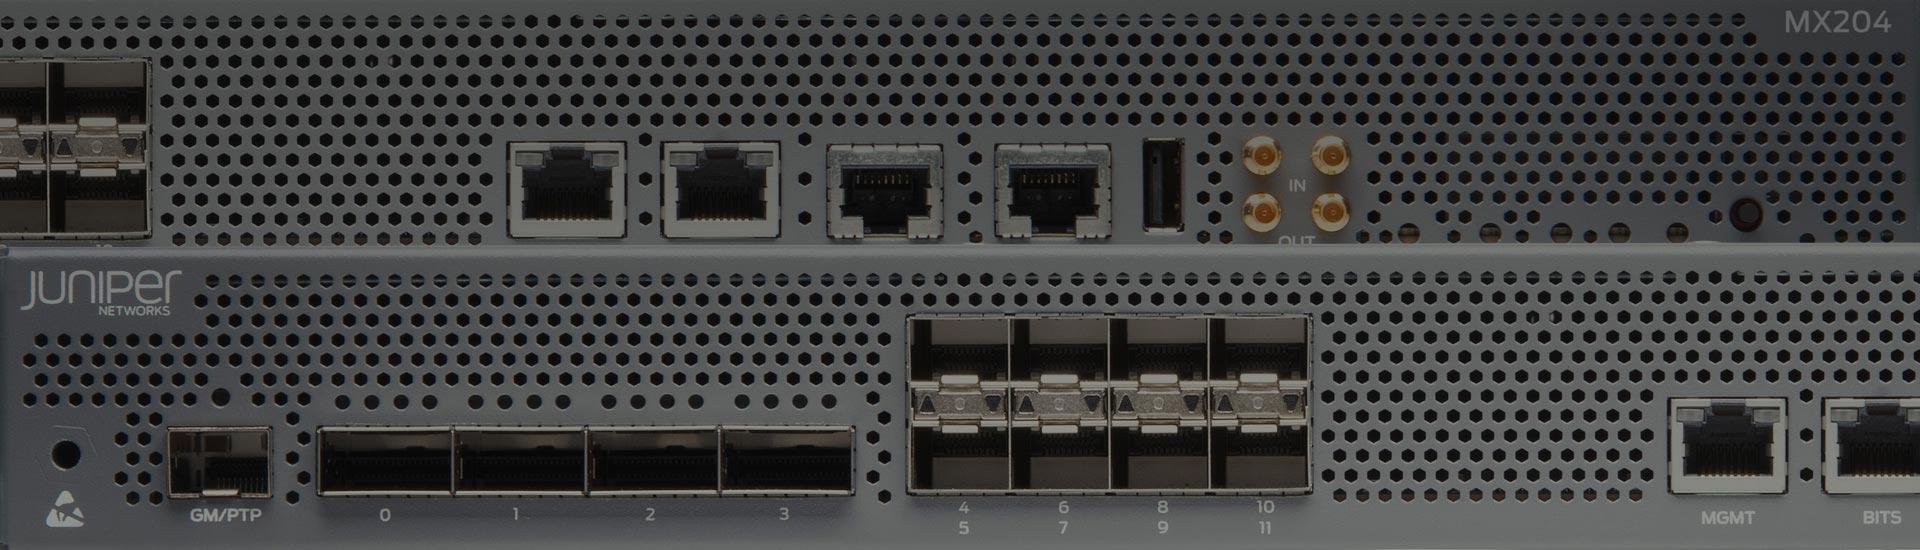 MX204 Universal Routing Platform – Juniper Networks